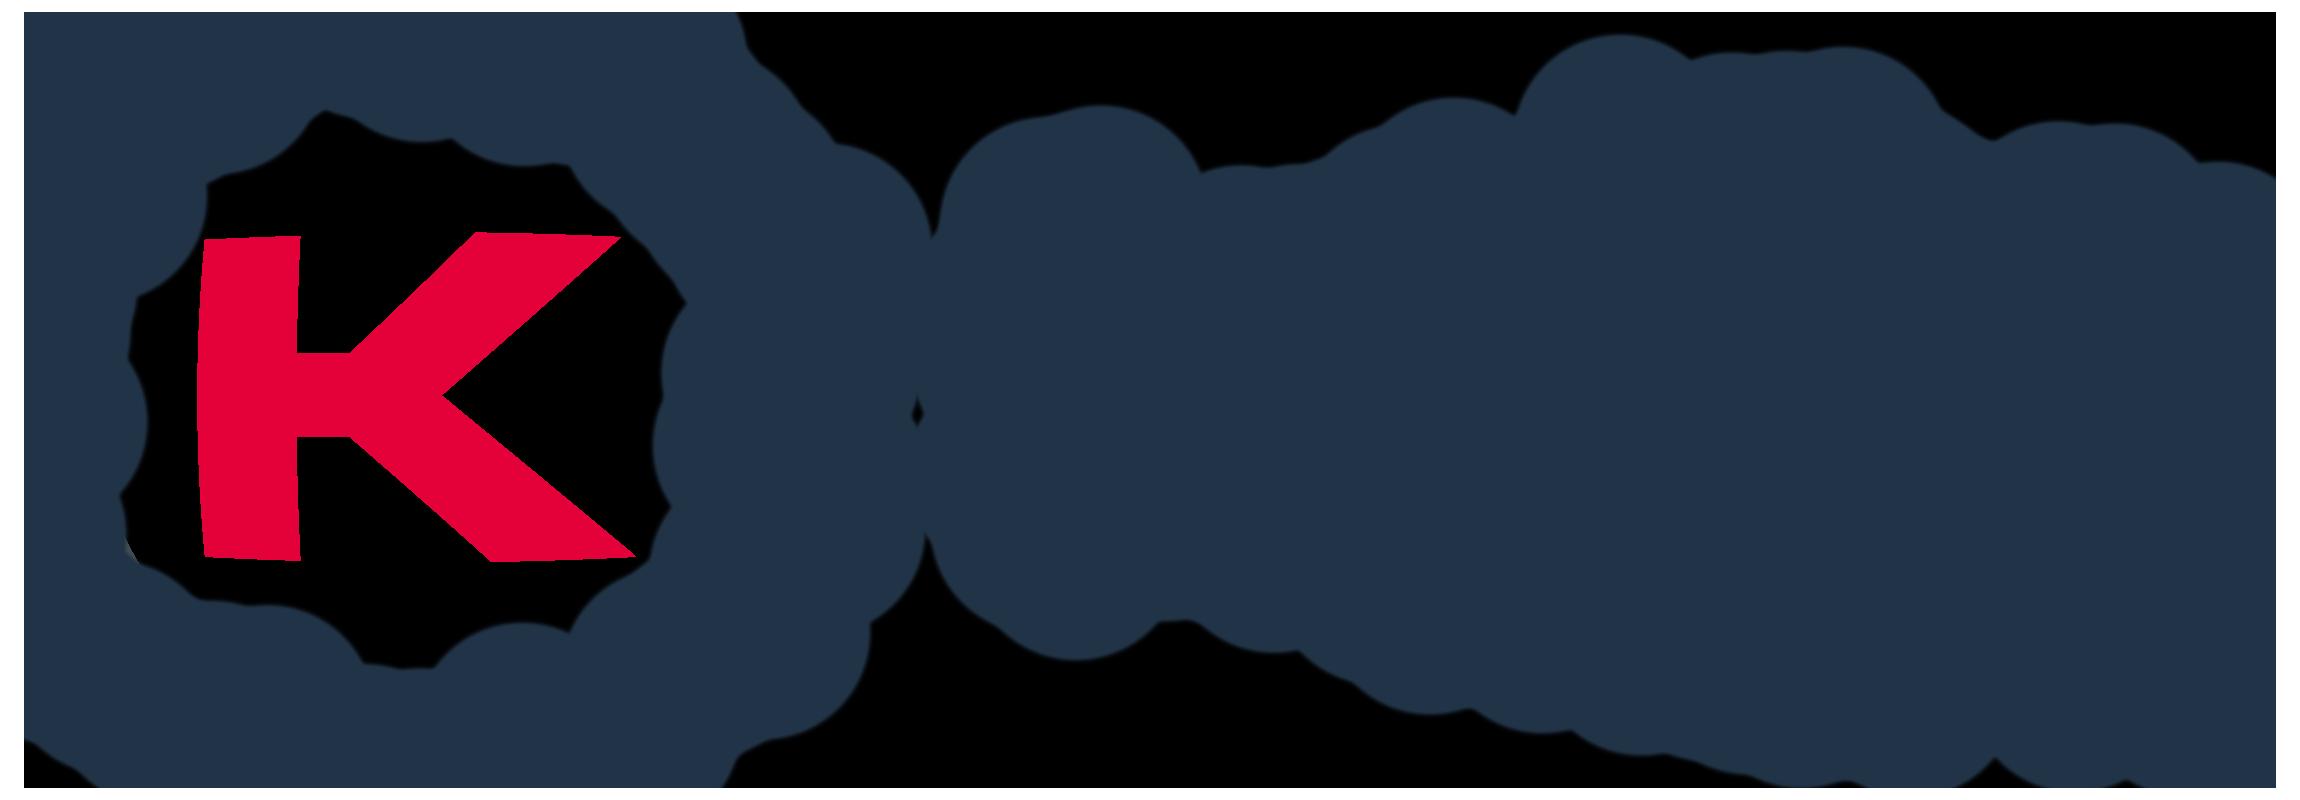 K-tronik-Logoblaurot-2252x776